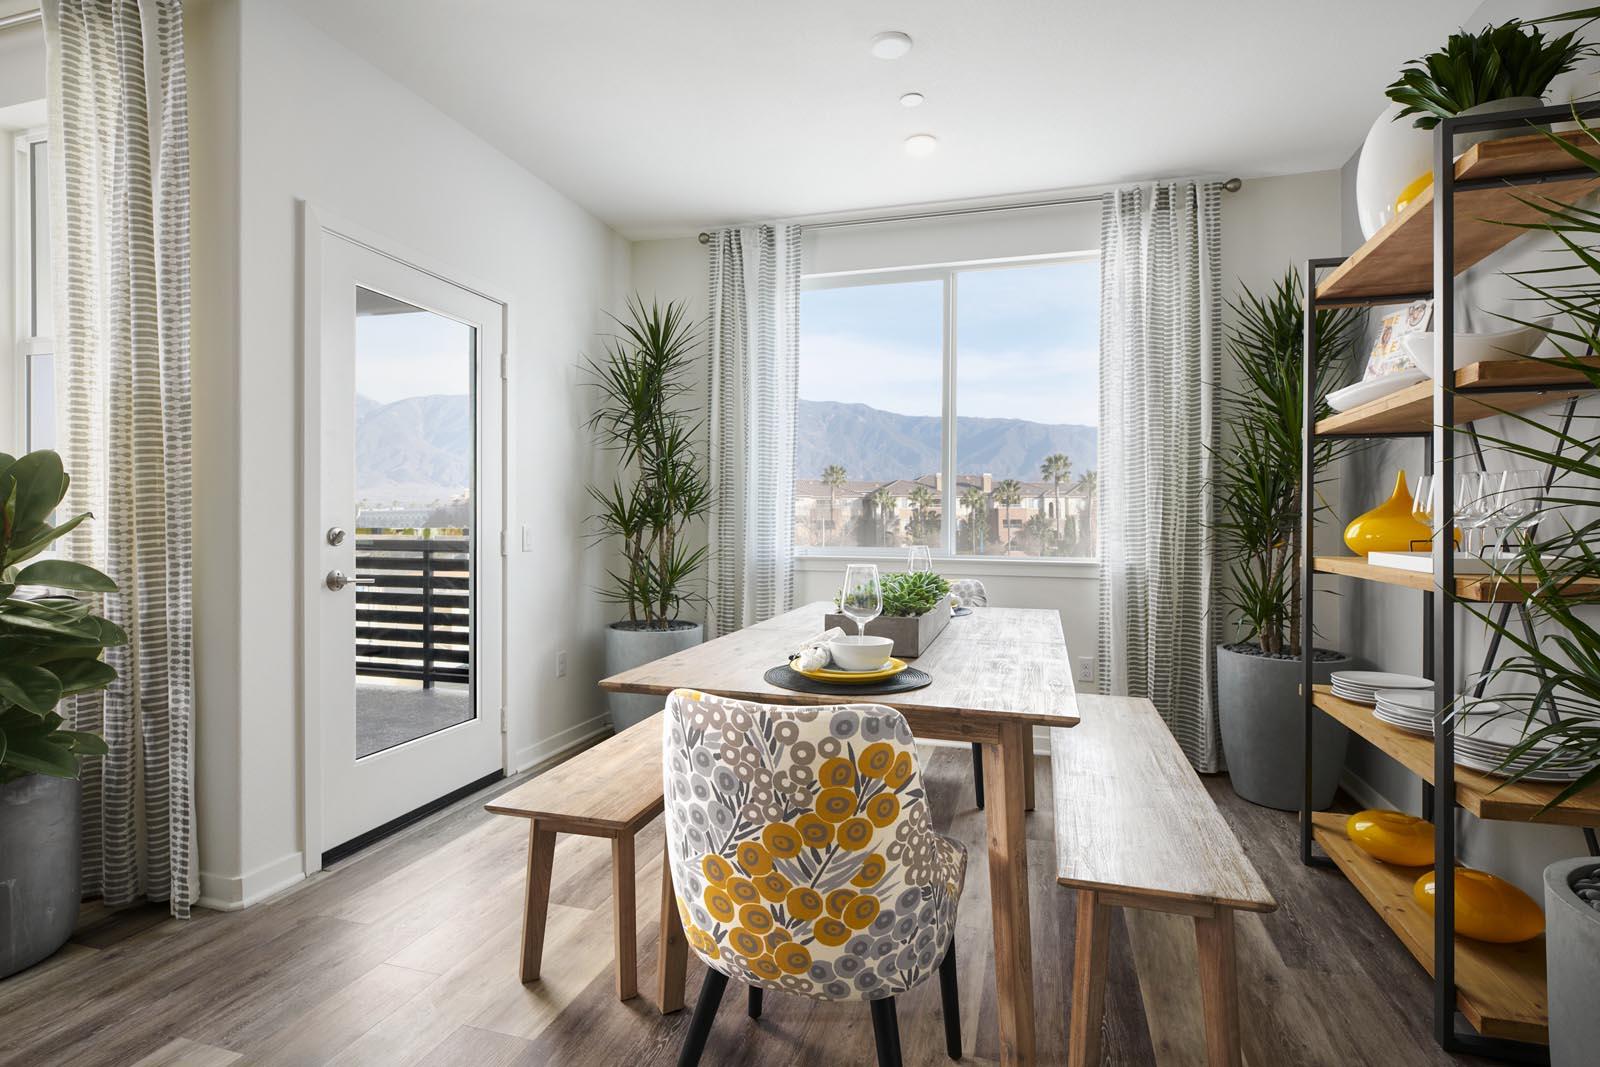 Dining Area | Residence 1 | Aspire | New Homes in Rancho Cucamonga, CA | Van Daele Homes